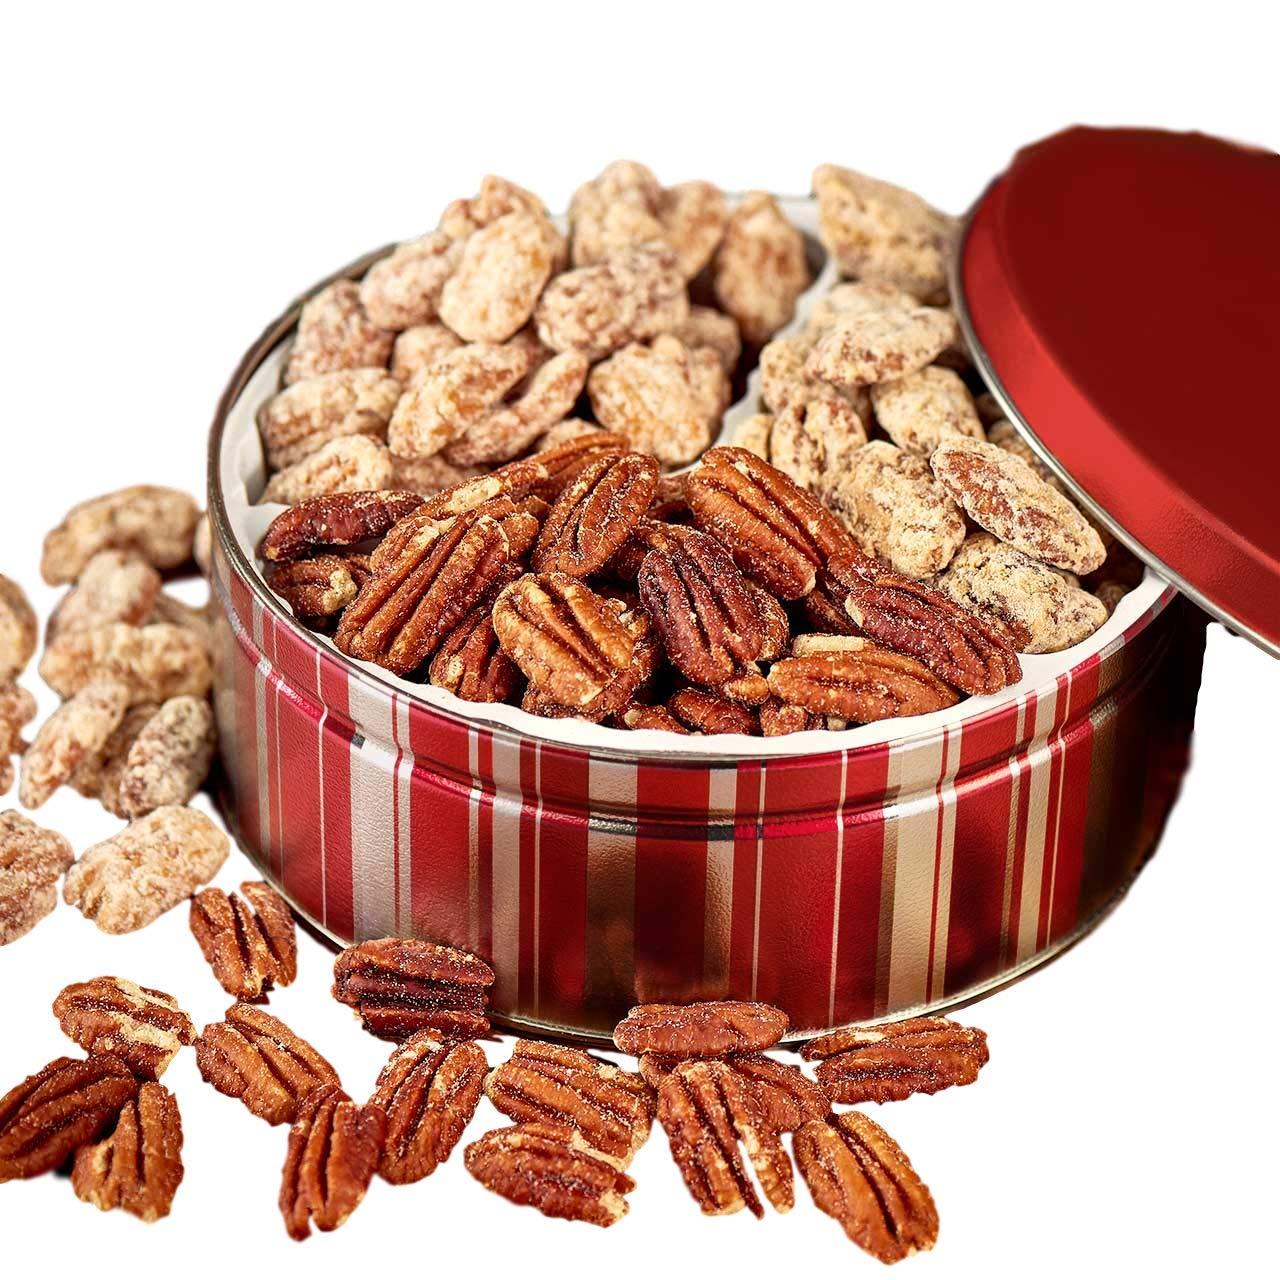 Savannah Candy Kitchen | Sweet & Salty Nut Tin | Praline, Cinnamon, and Roasted & Salted Pecan Gift Tin - 18oz